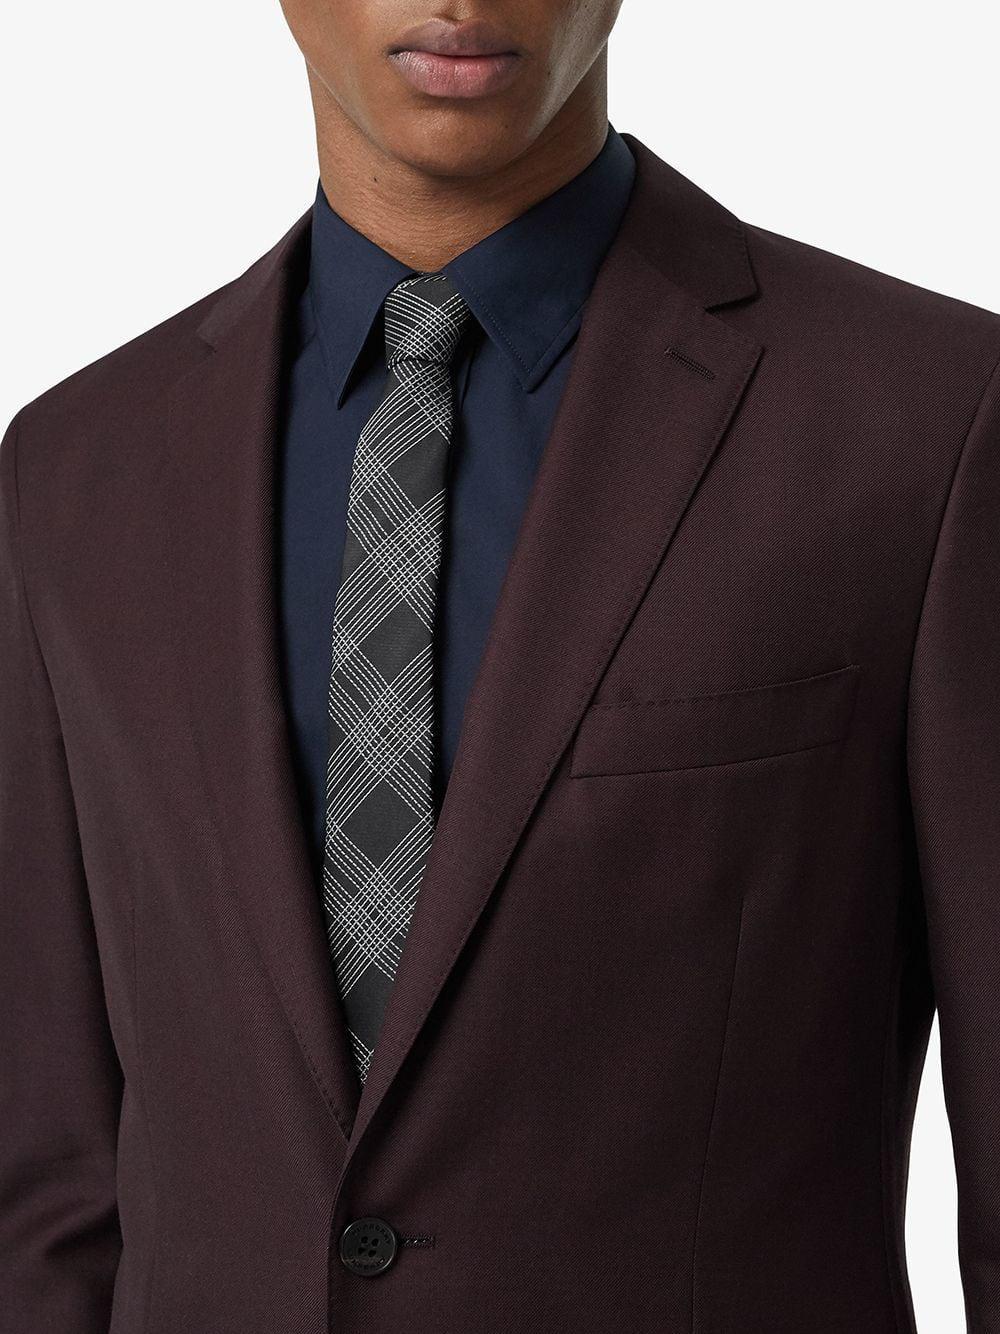 fa124cdccbda Lyst - Burberry Modern Cut Check Silk Jacquard Tie in Black for Men